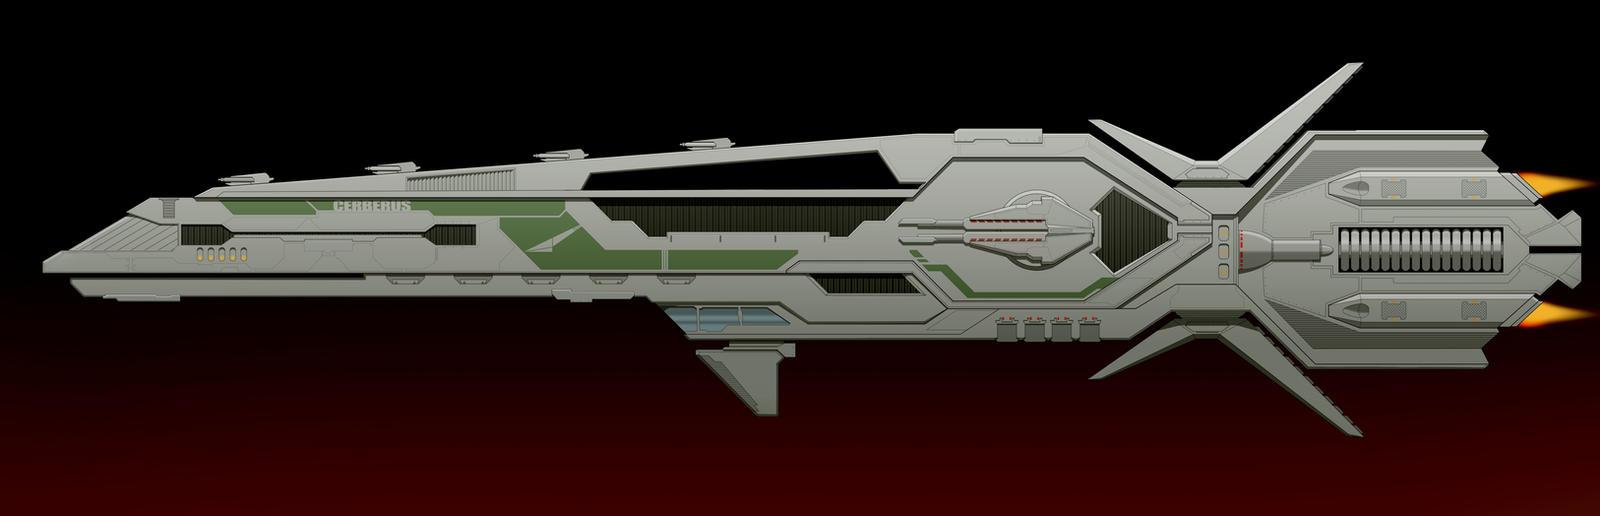 Sci-Fi Destroyer by AdamKop